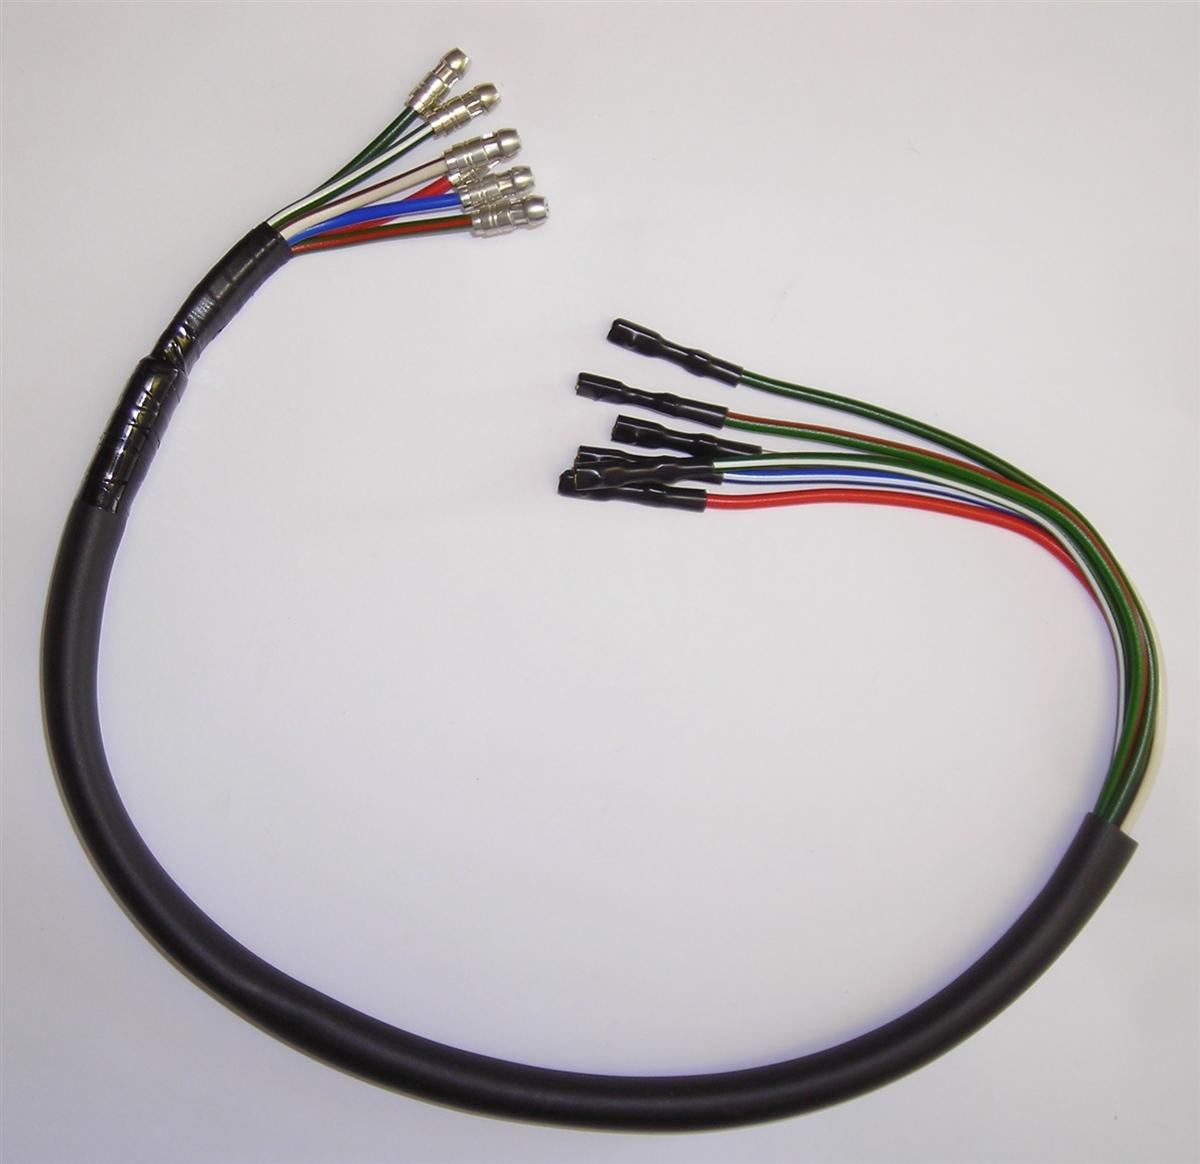 Amazing Norton Commando 850Cc Mk3 Motorcycle Console Wiring Harness Wiring Digital Resources Unprprontobusorg